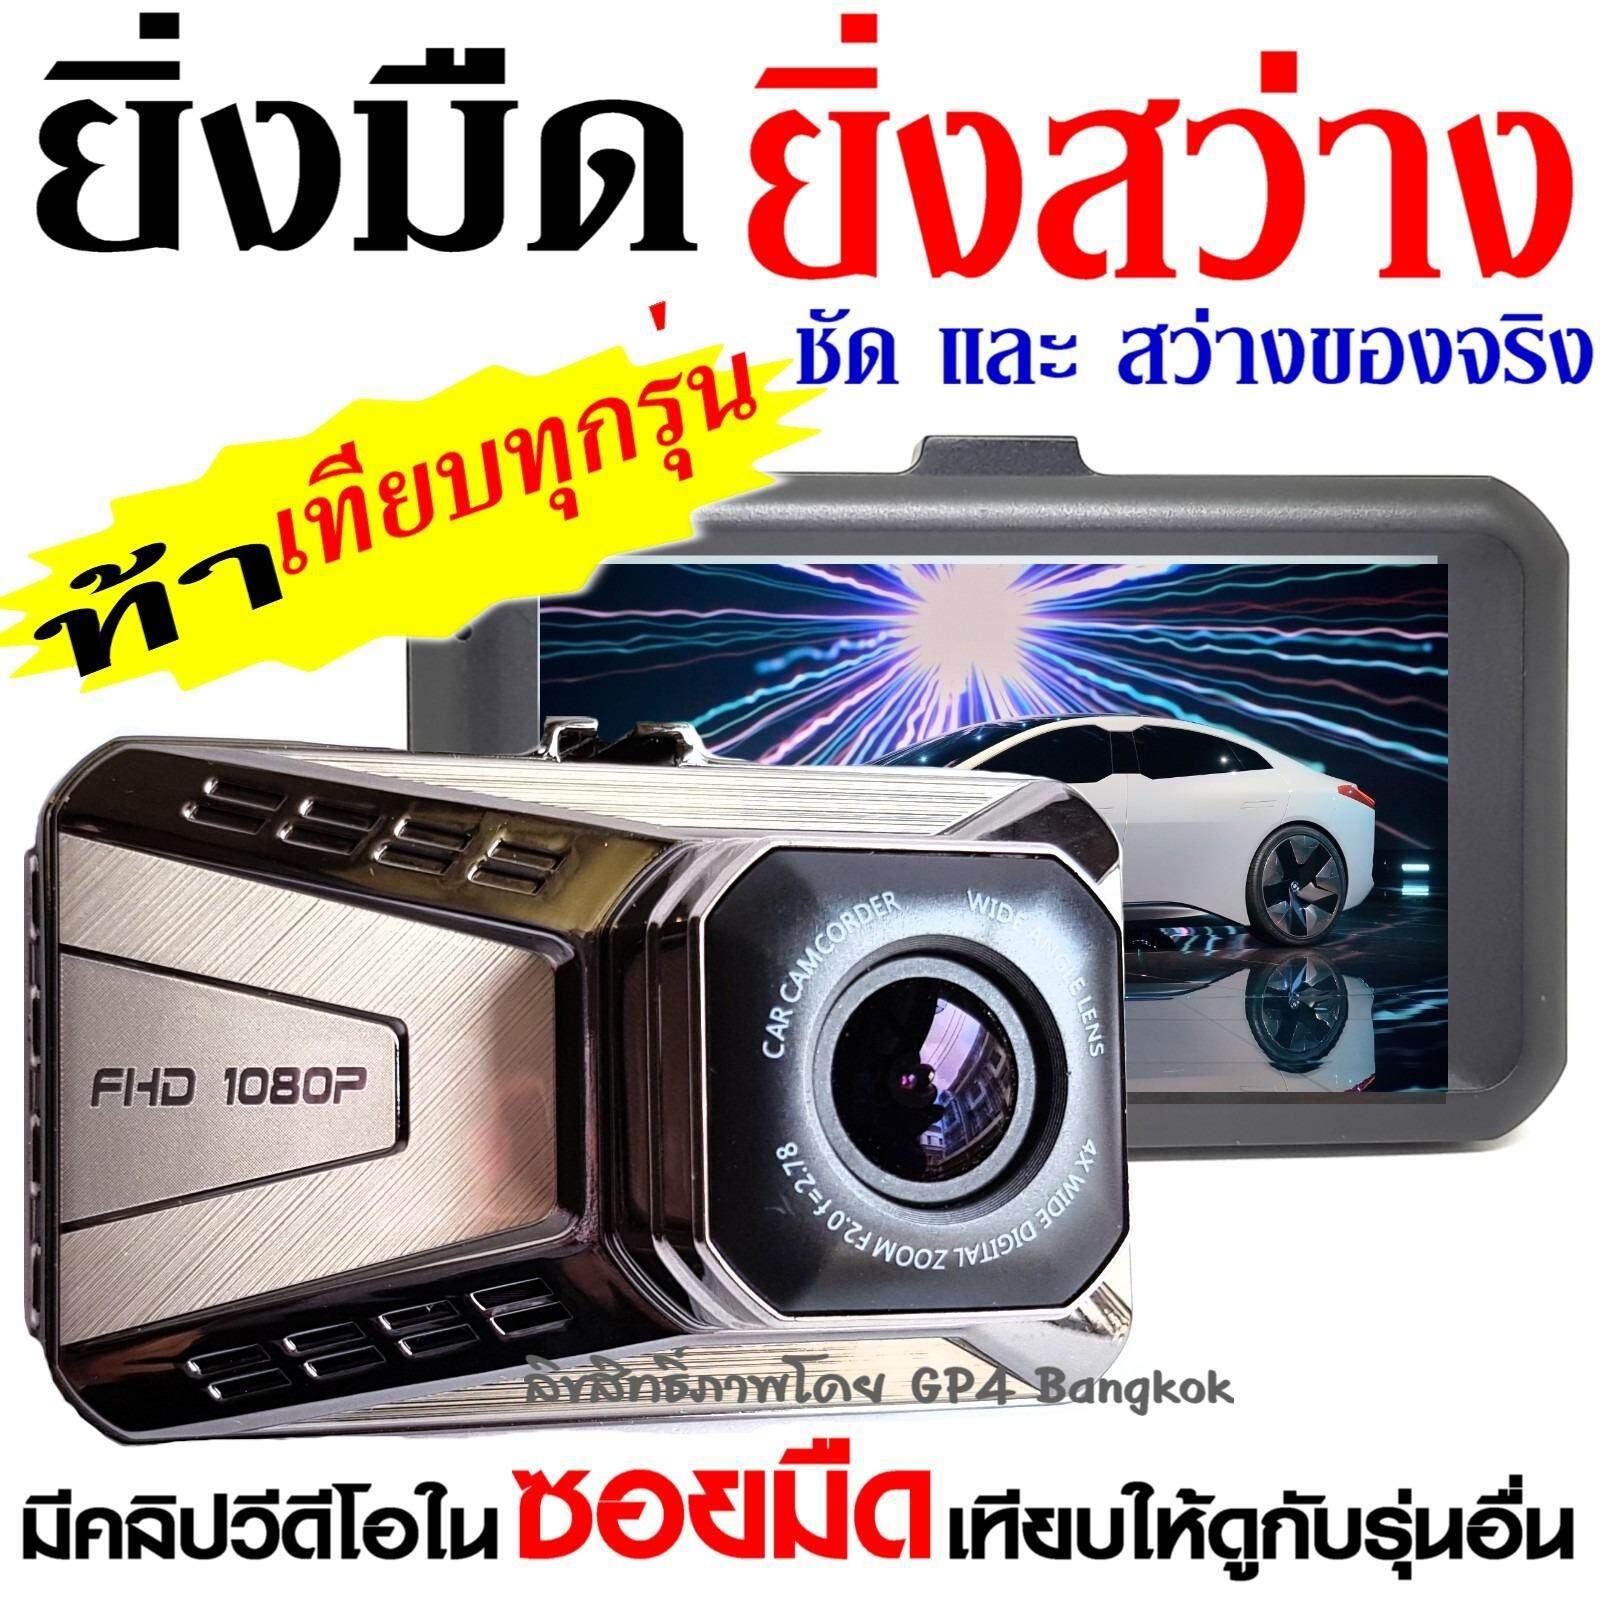 GP4 กล้องติดรถยนต์ กลางคืนสว่างที่สุด WDR + Super Night Vision + LDWS (เตือนออกนอกเลนส์) +FCWS (เตือนรถใกล้คันหน้าเกินไป) + Parking Monitor บอดี้โลหะ จอใหญ่ 3.0นิ้ว FHD 1080P เมนูไทย รุ่น T990SE (Silver) -  มีคลิปวีดีโอในซอยมืดเปรียบเทียบกับรุ่นอื่นให้ดู